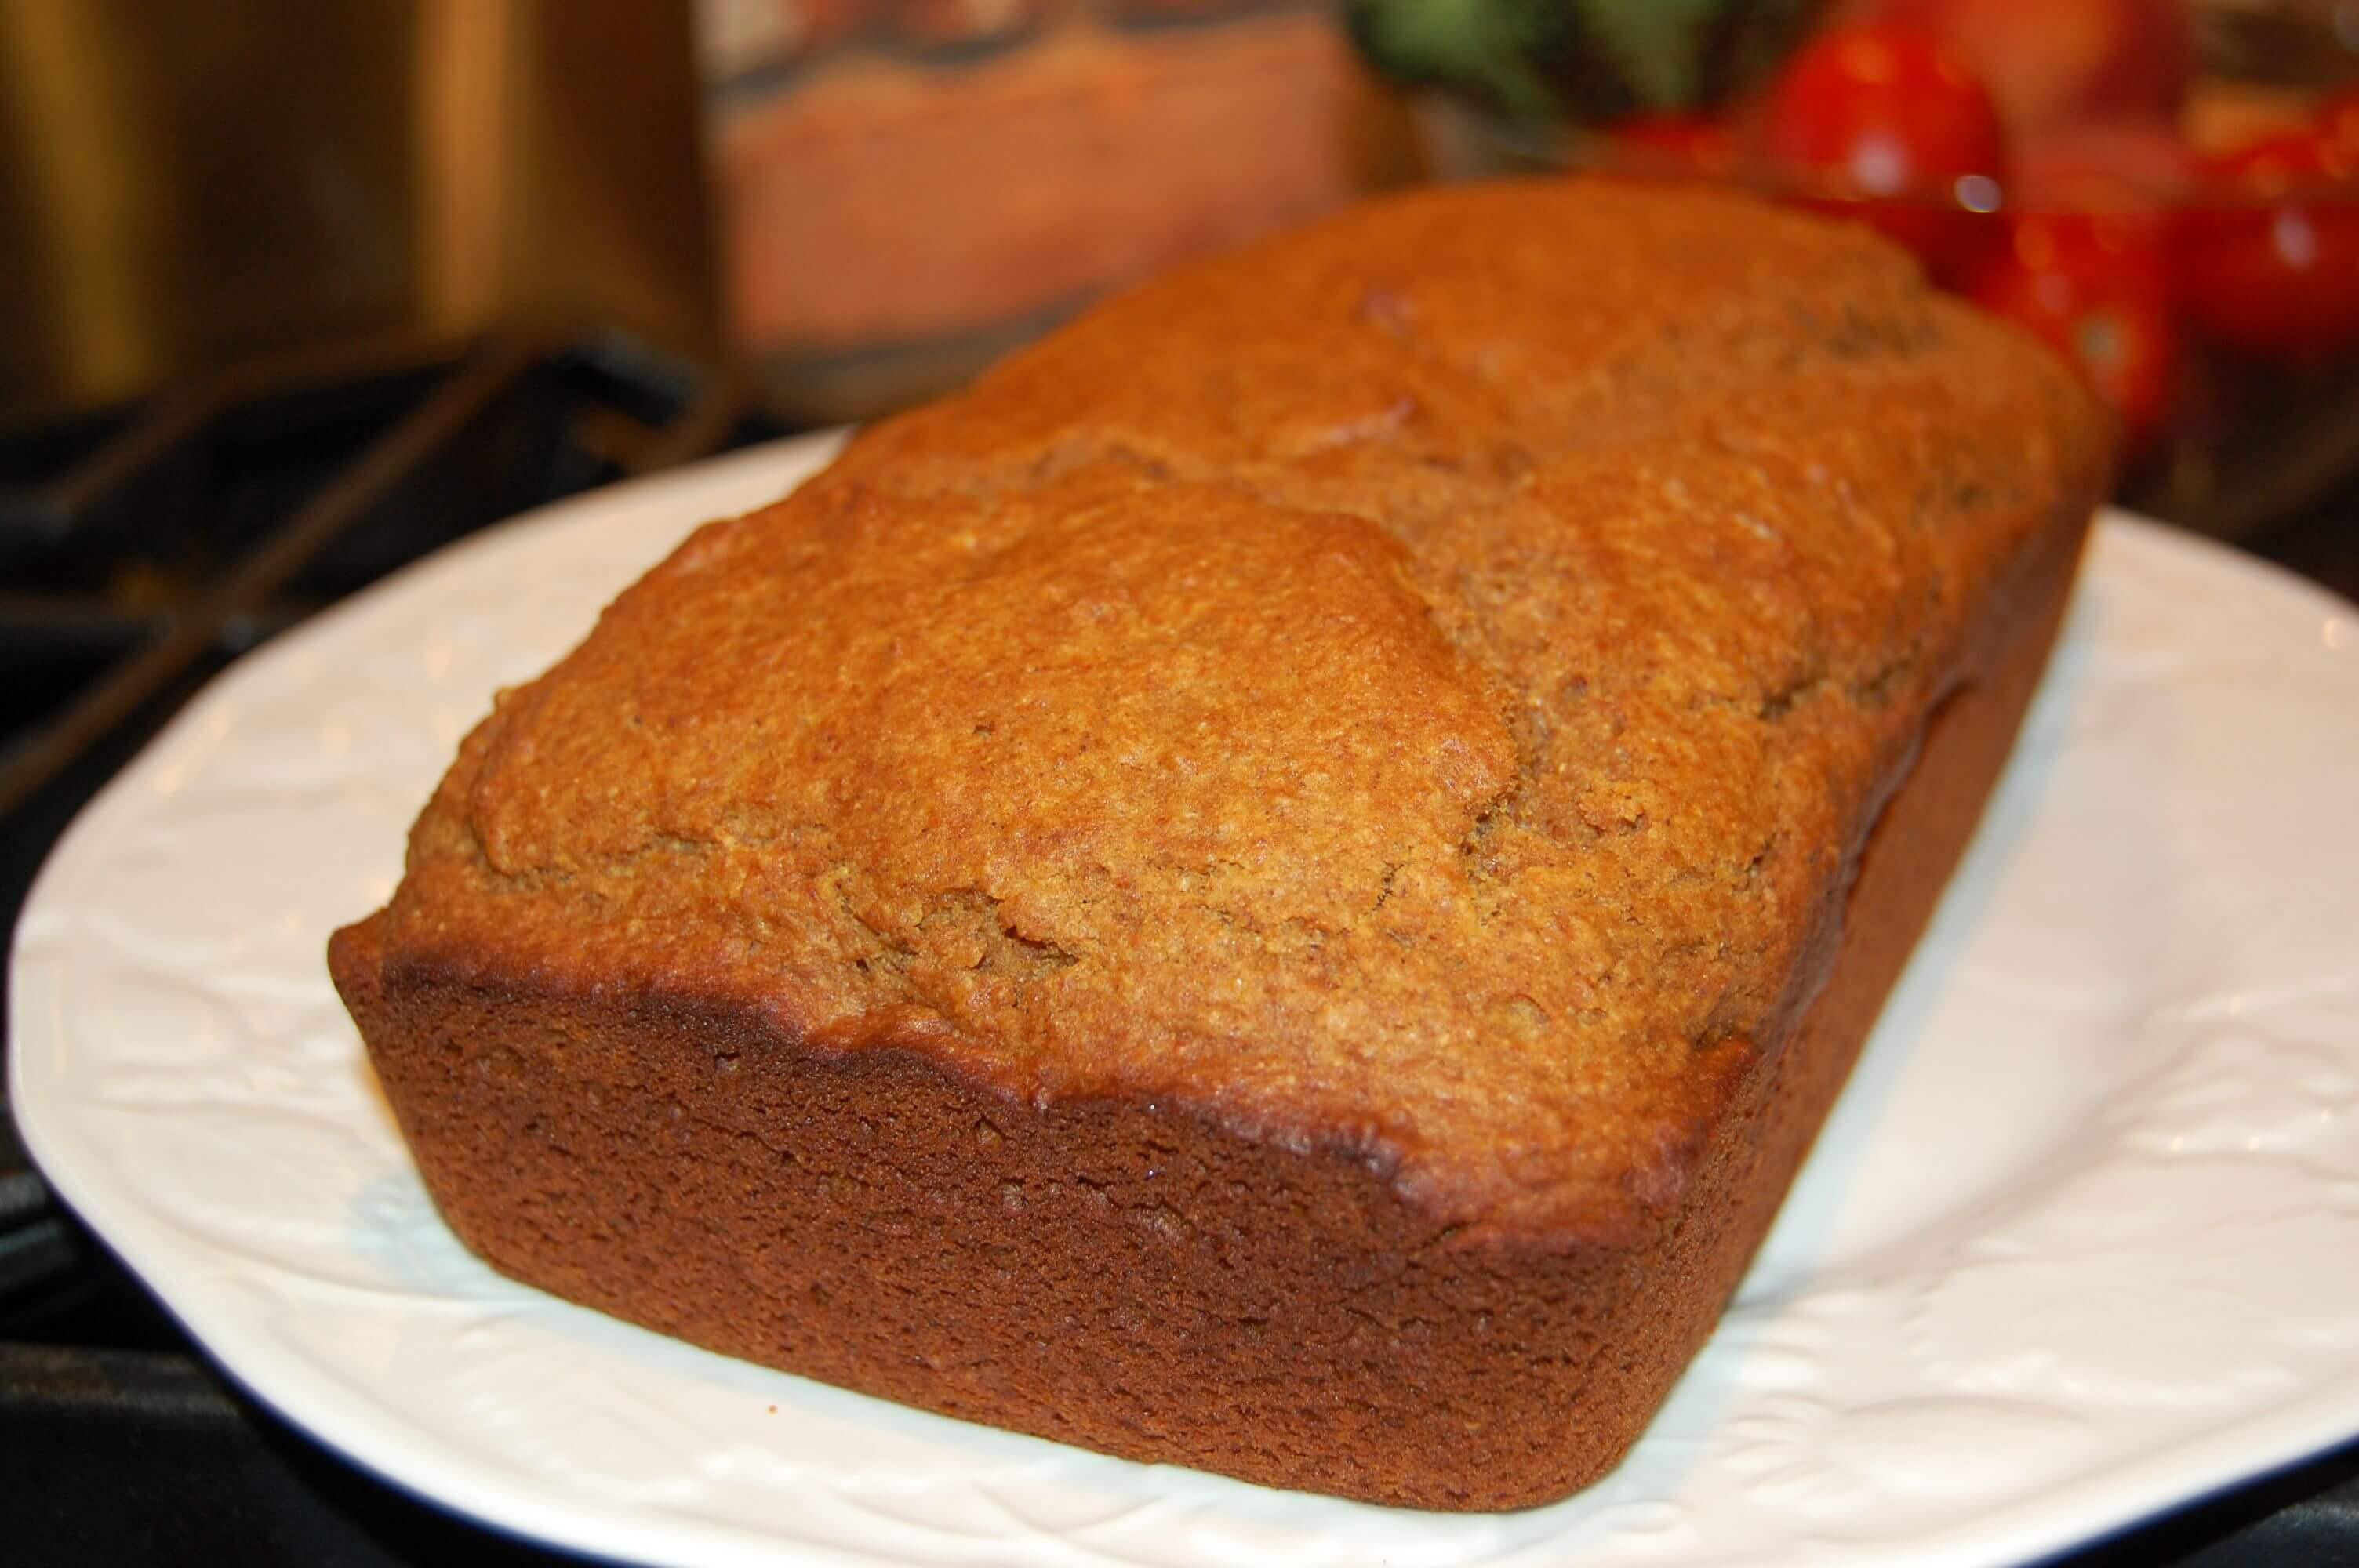 Pumpkin Bread With Fresh Pumpkin  Whole Wheat Healthy Pumpkin Bread 100 Days of Real Food